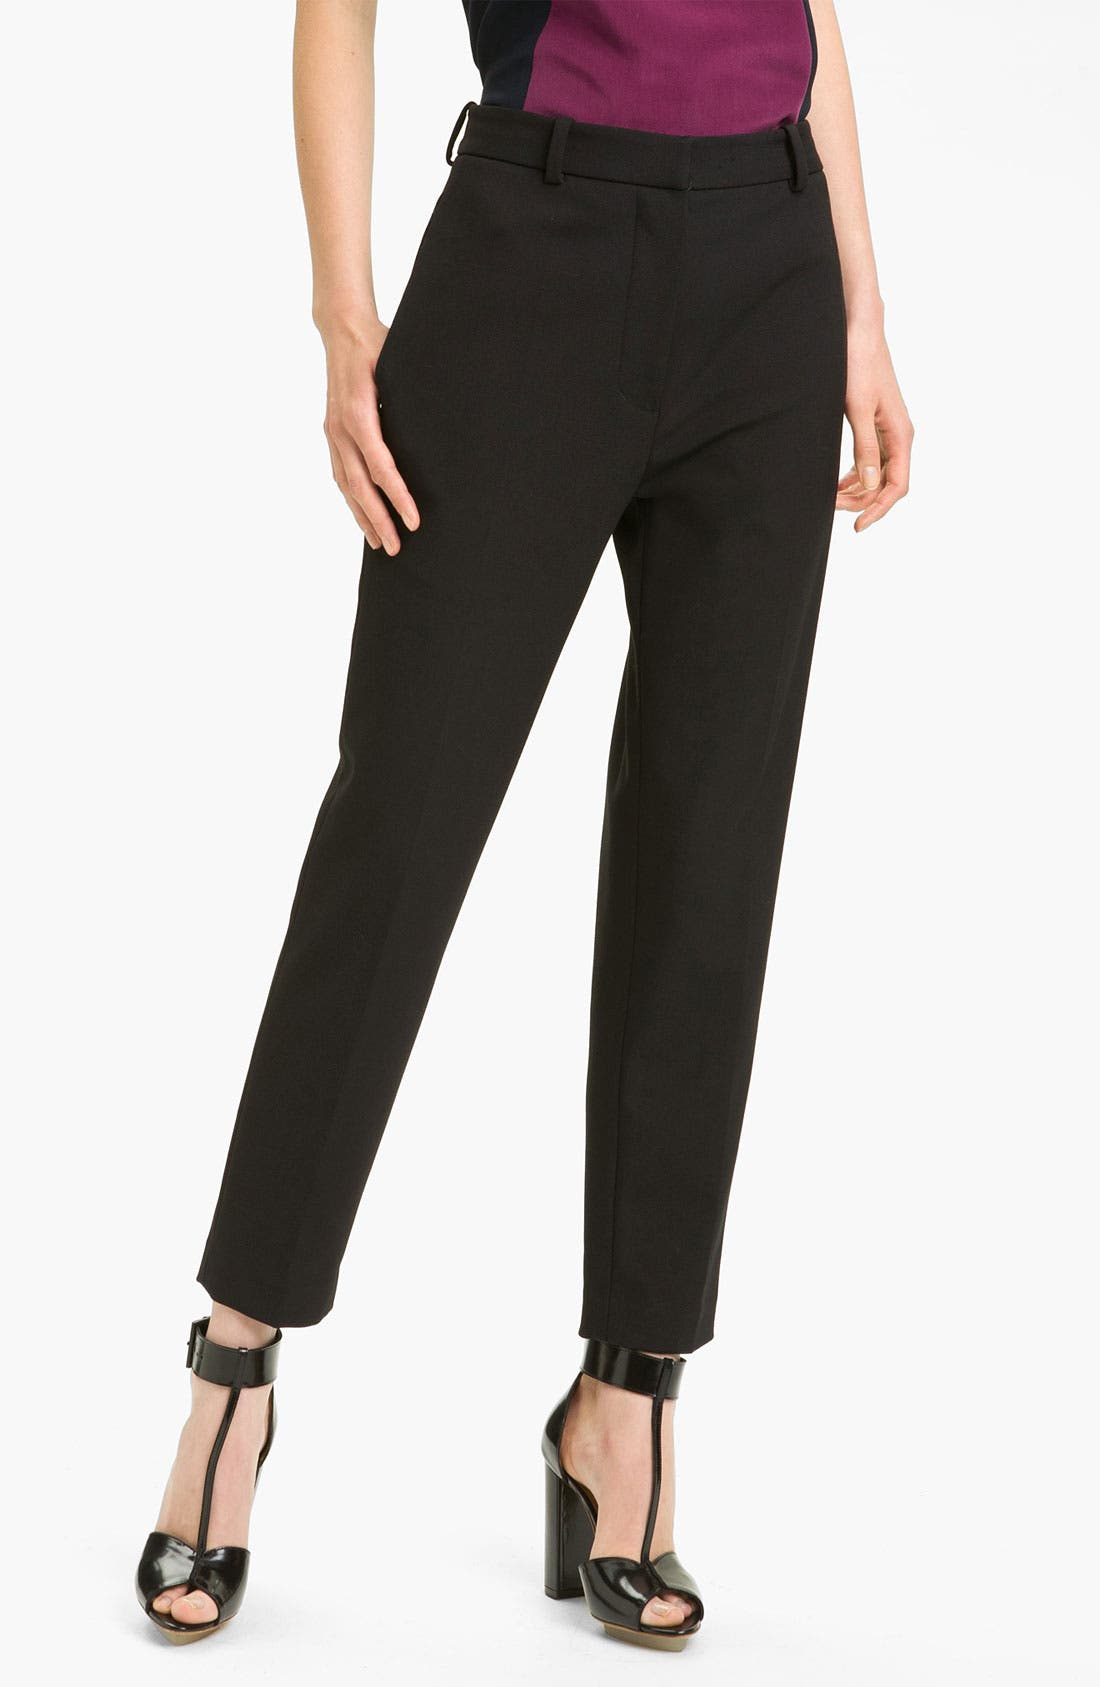 Alternate Image 1 Selected - 3.1 Phillip Lim Crop Trousers